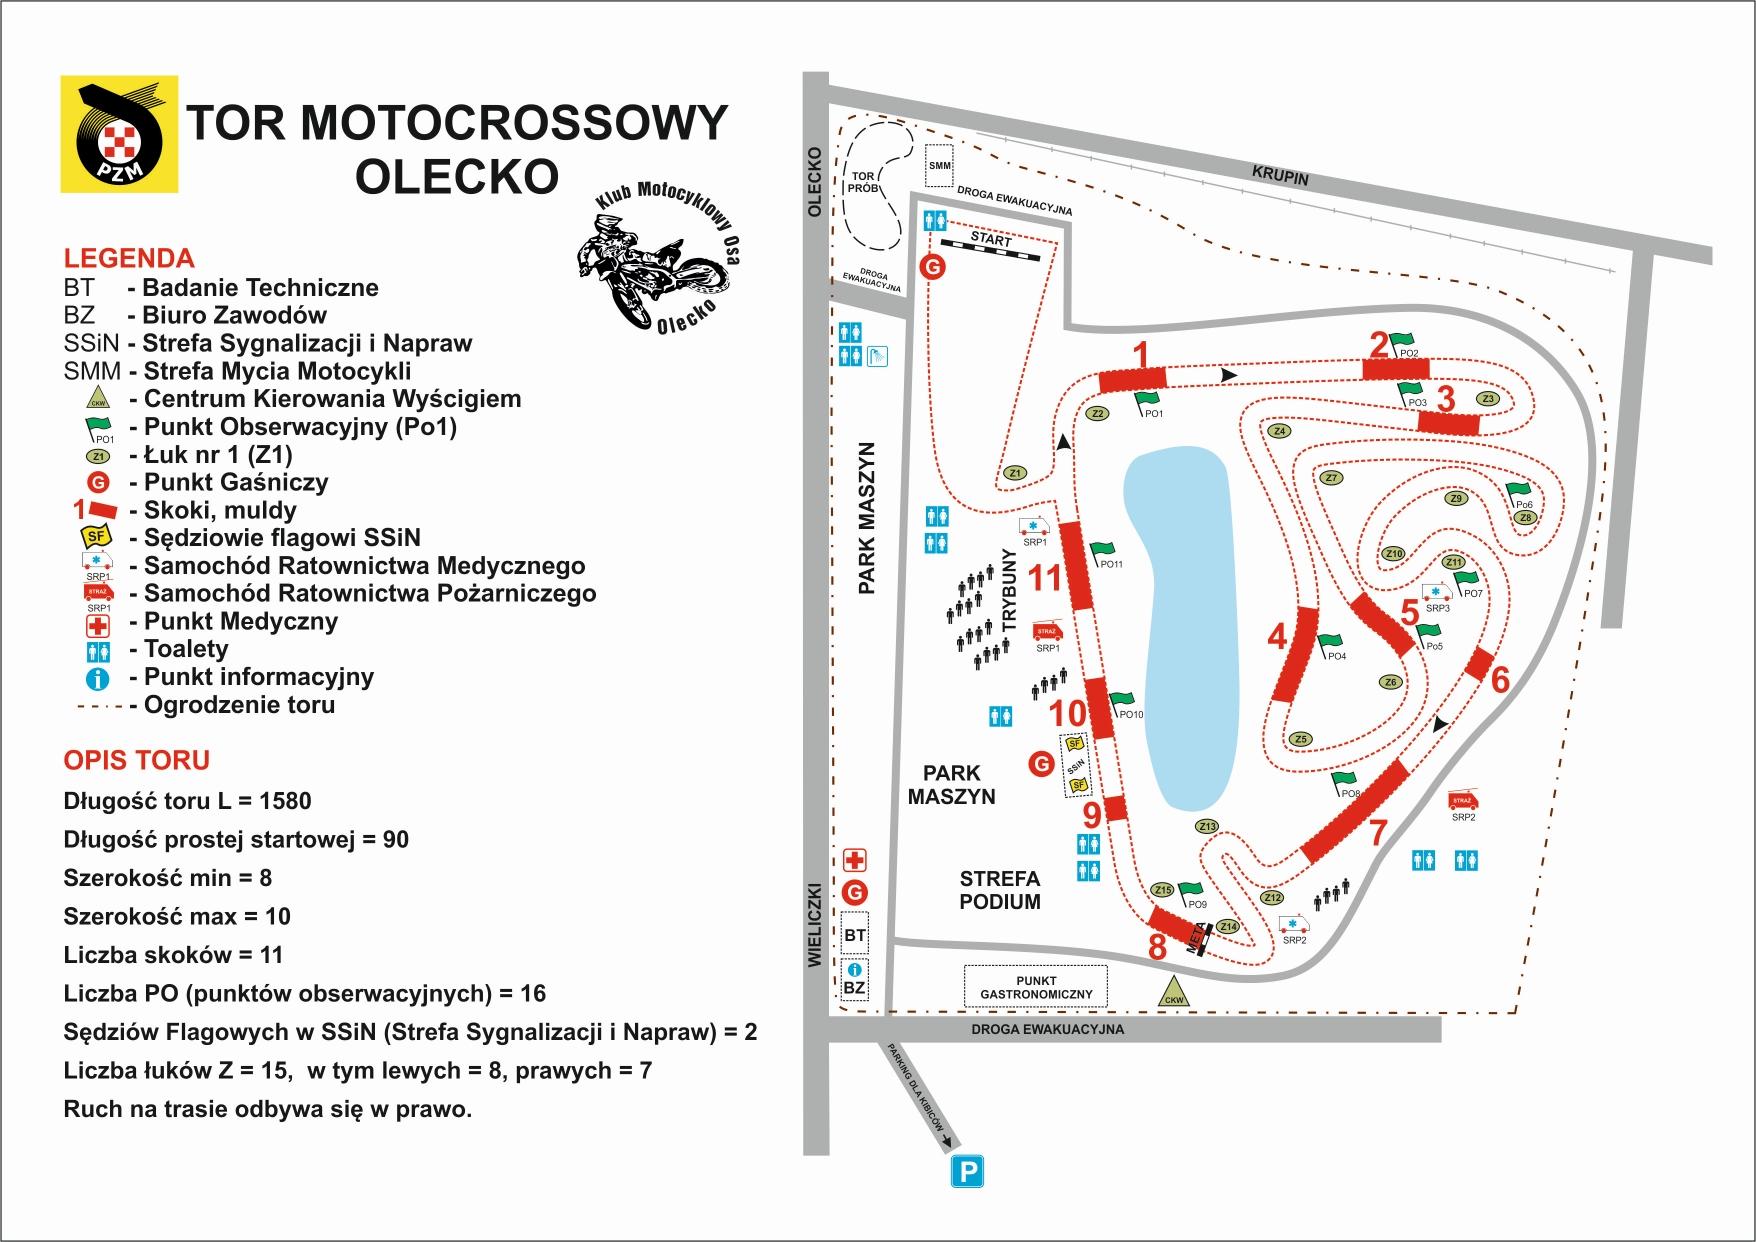 http://m.wm.pl/2019/05/orig/motocross-mapka-1-548087.jpg